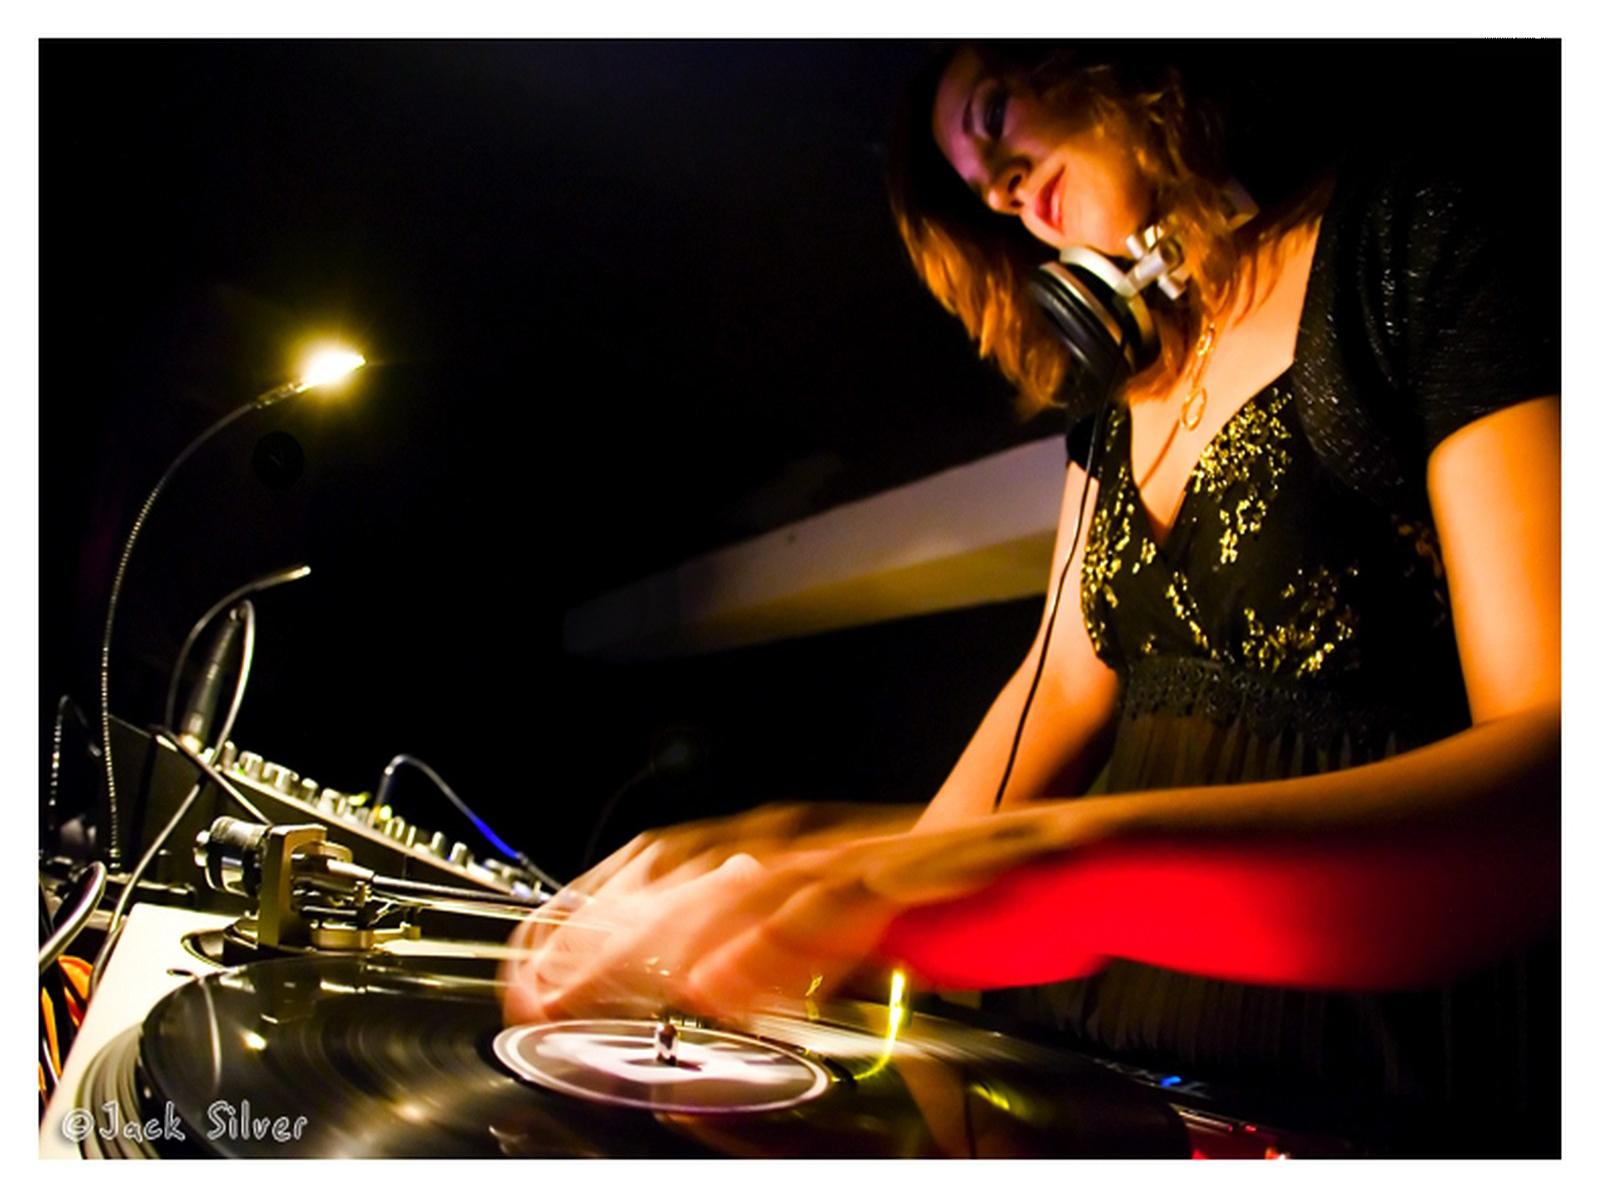 http://2.bp.blogspot.com/-L8QcTTb9g5o/TyCOqWVddeI/AAAAAAAAACA/BSGIEaO9_Uo/s1600/Dj+Female+Play+1600x1200+Club+Music+Wallpaper.jpg